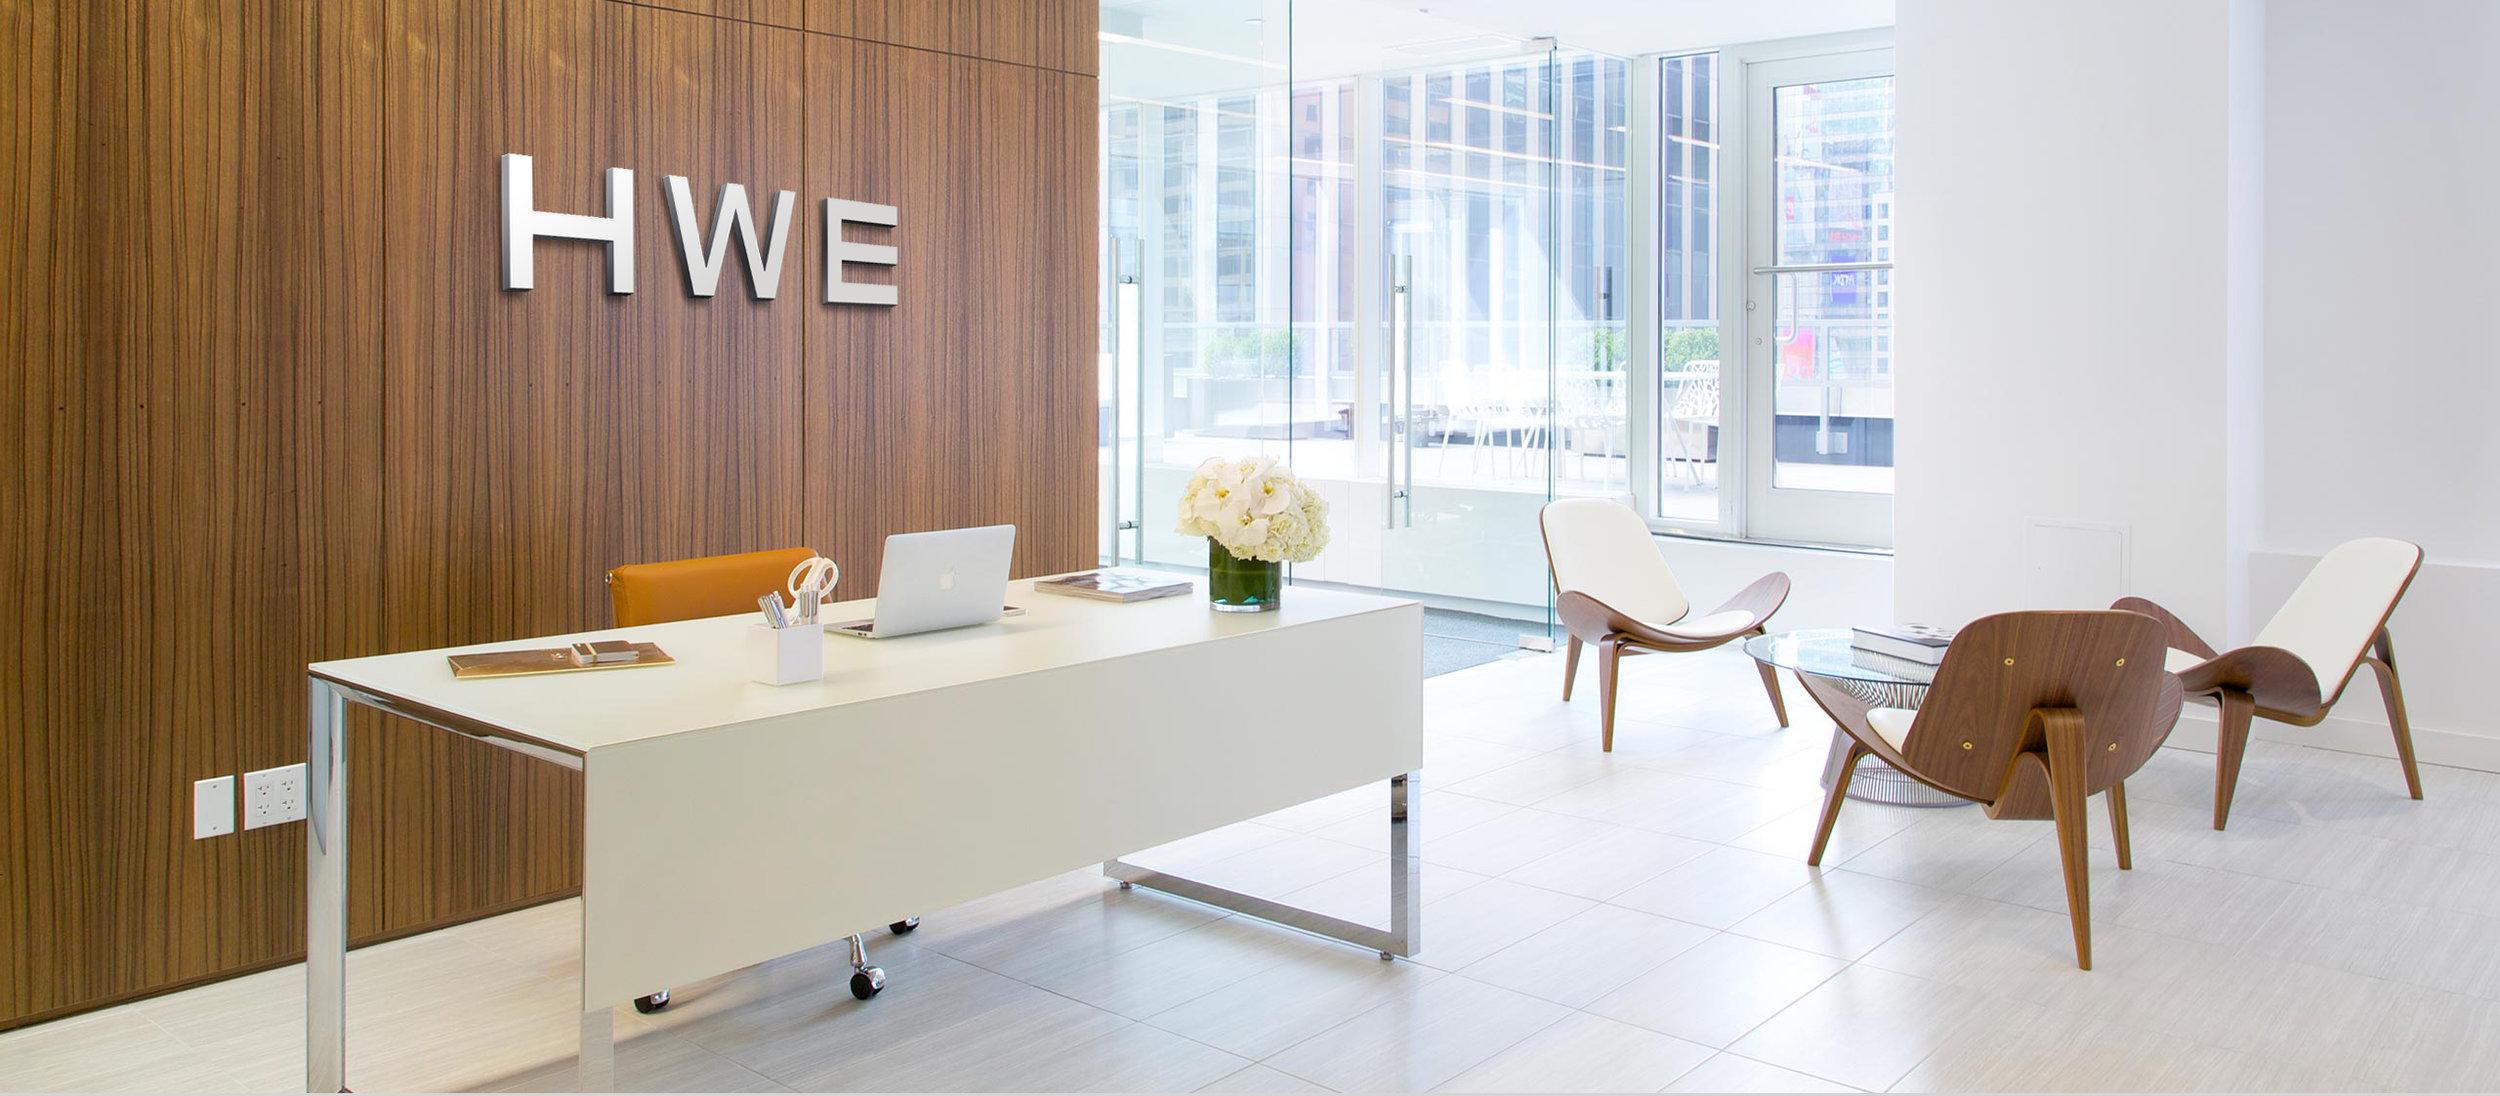 HWE_Office.jpg